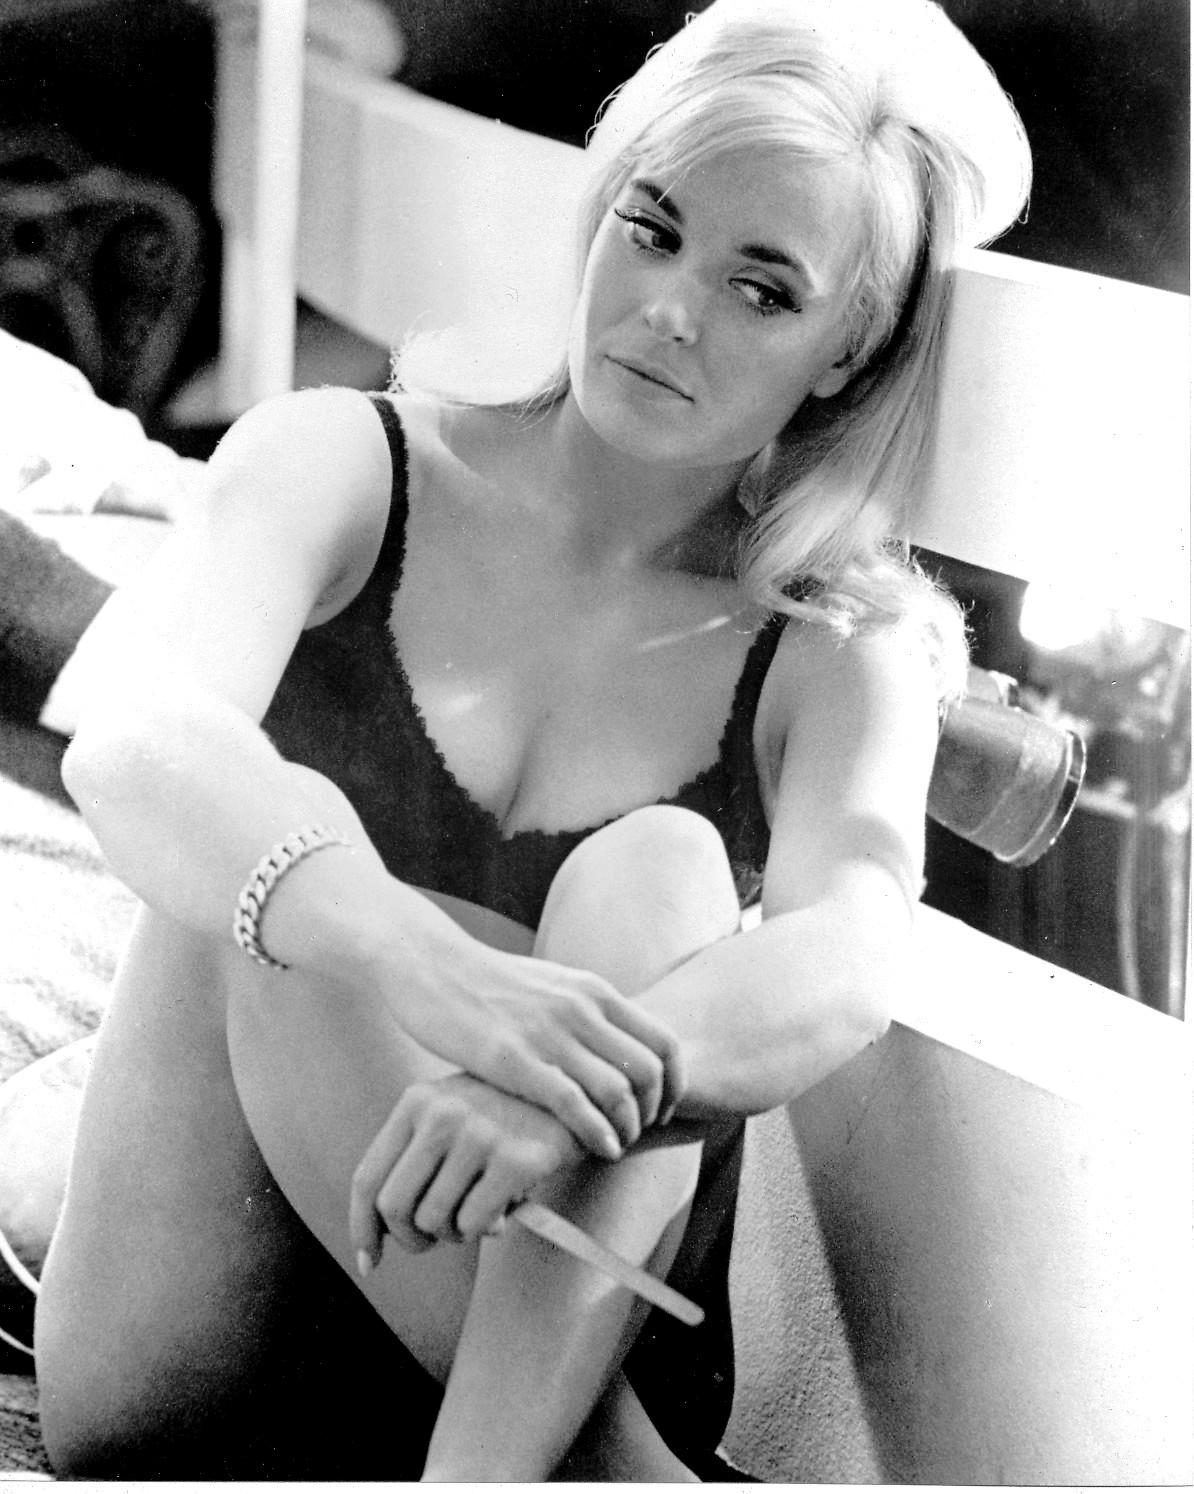 Michelle Triola Marvin,Florence Lee (born 1888) Sex image Heather MacRae,Jenilee Harrison born June 12, 1958 (age 60)